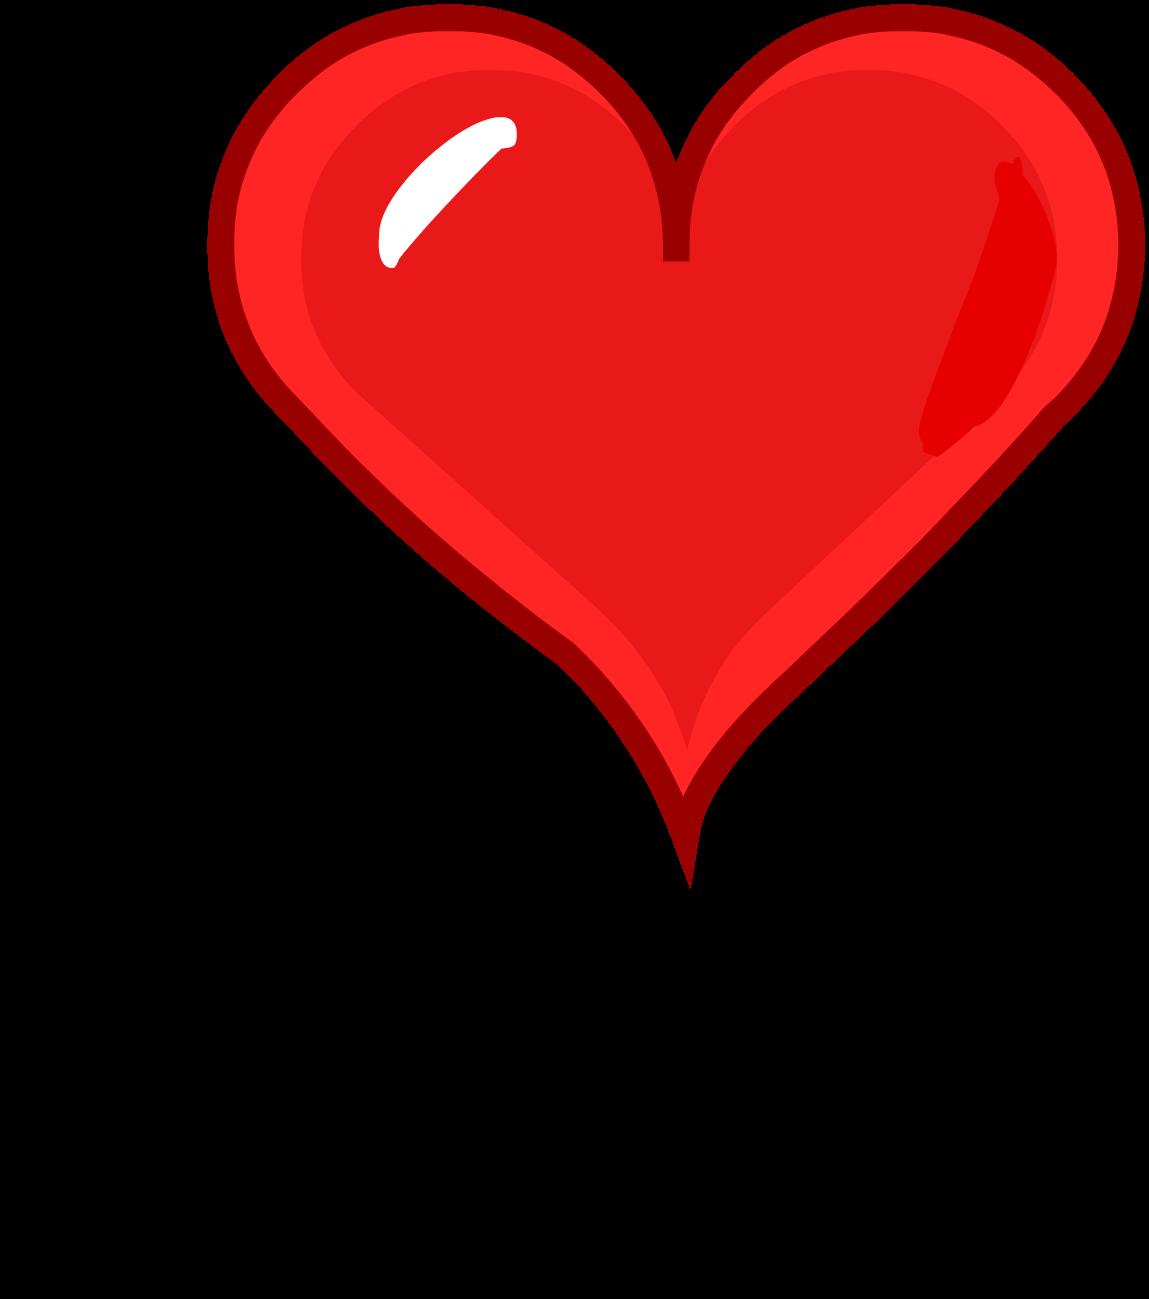 Clipart heart dagger. Image png random object